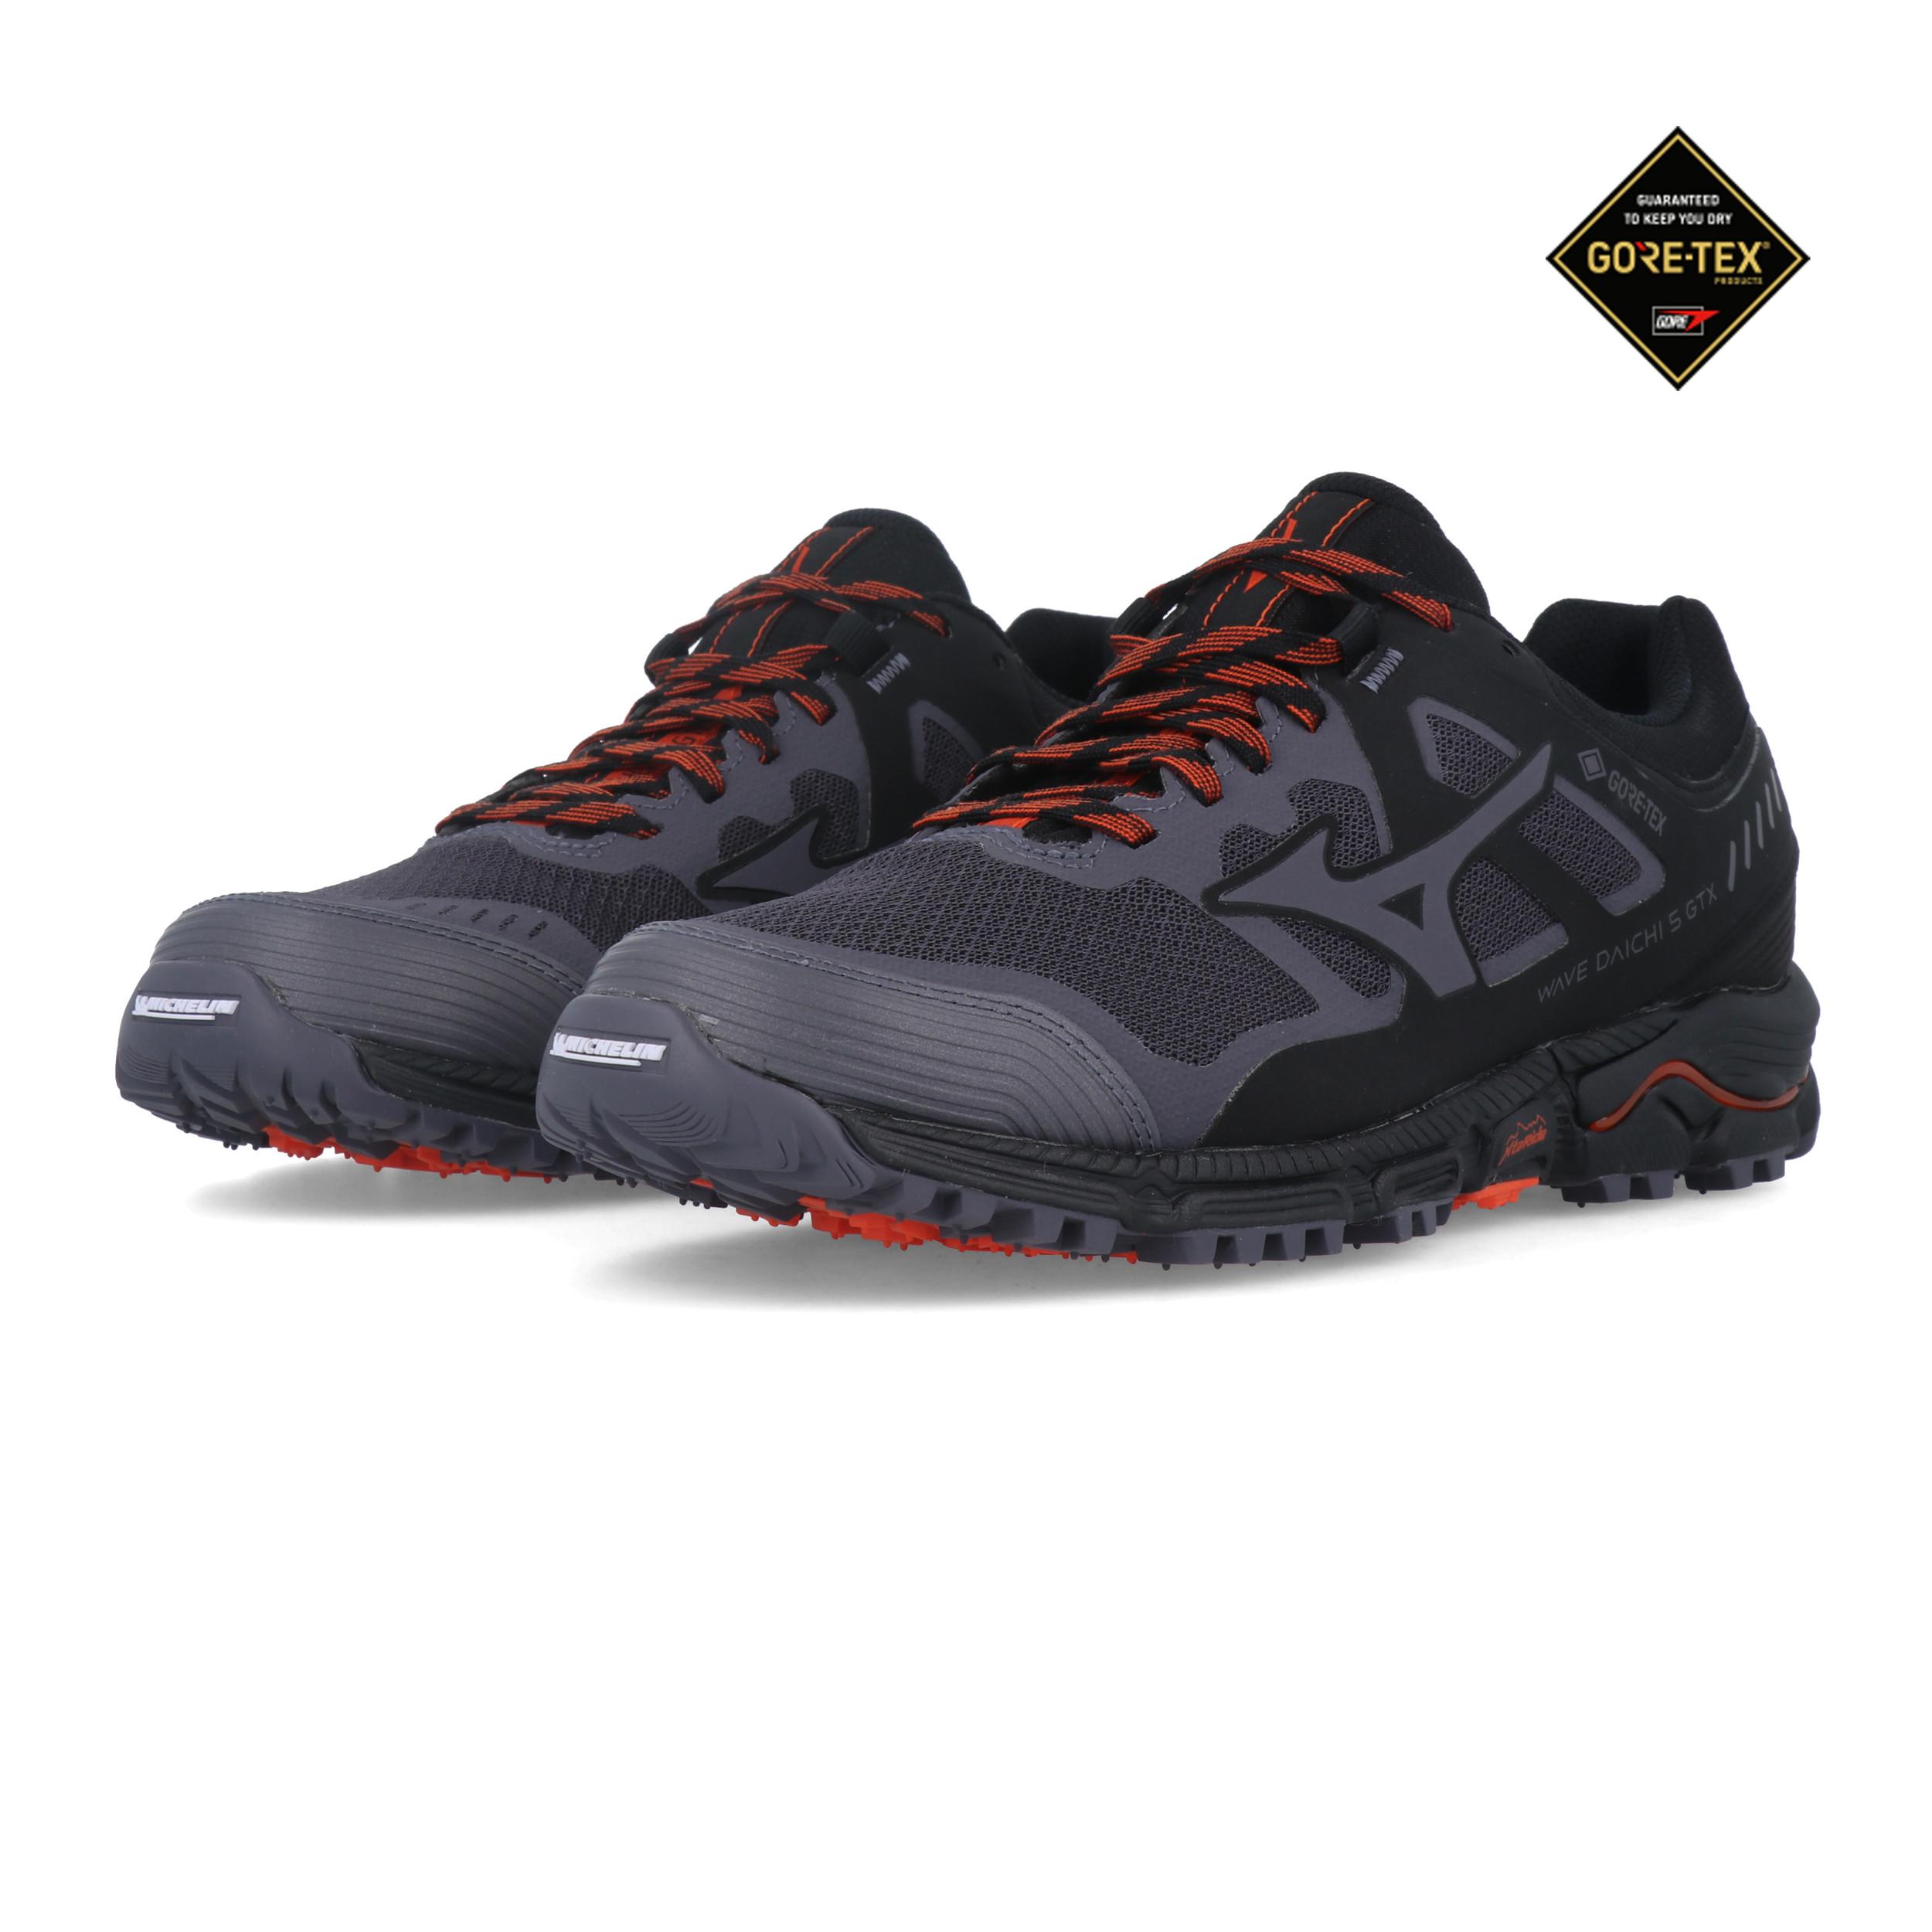 Mizuno Wave Daichi 5 GORE-TEX Trail Running Shoes - SS20